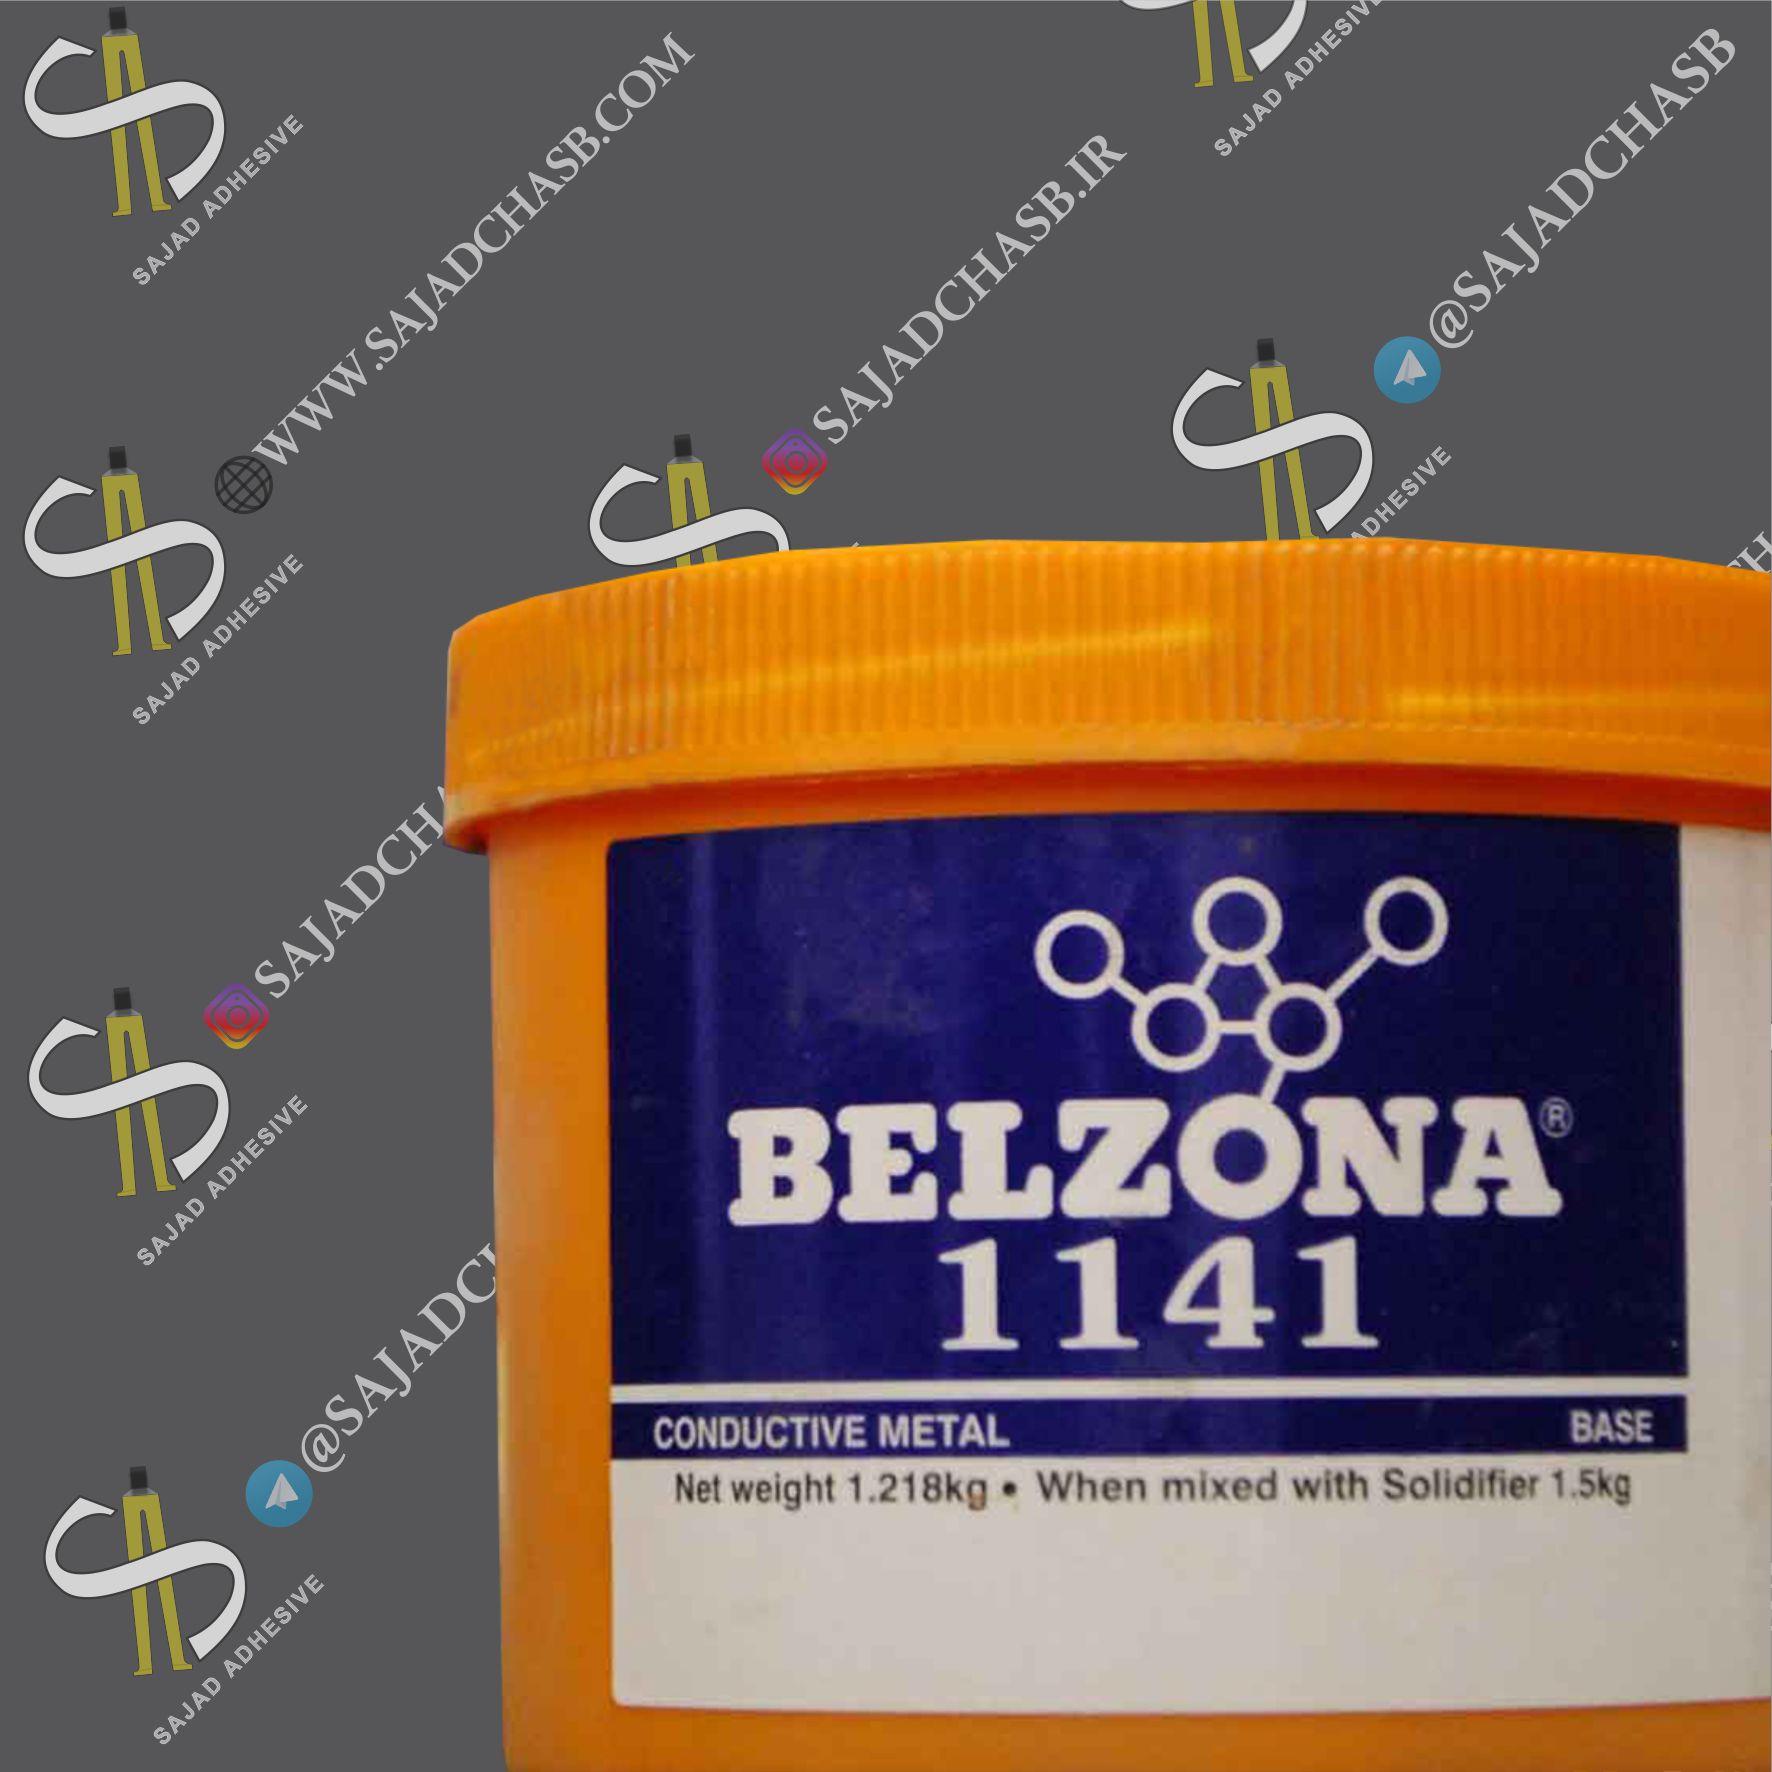 چسب اپوکسی بلزونا BELZONA 1141